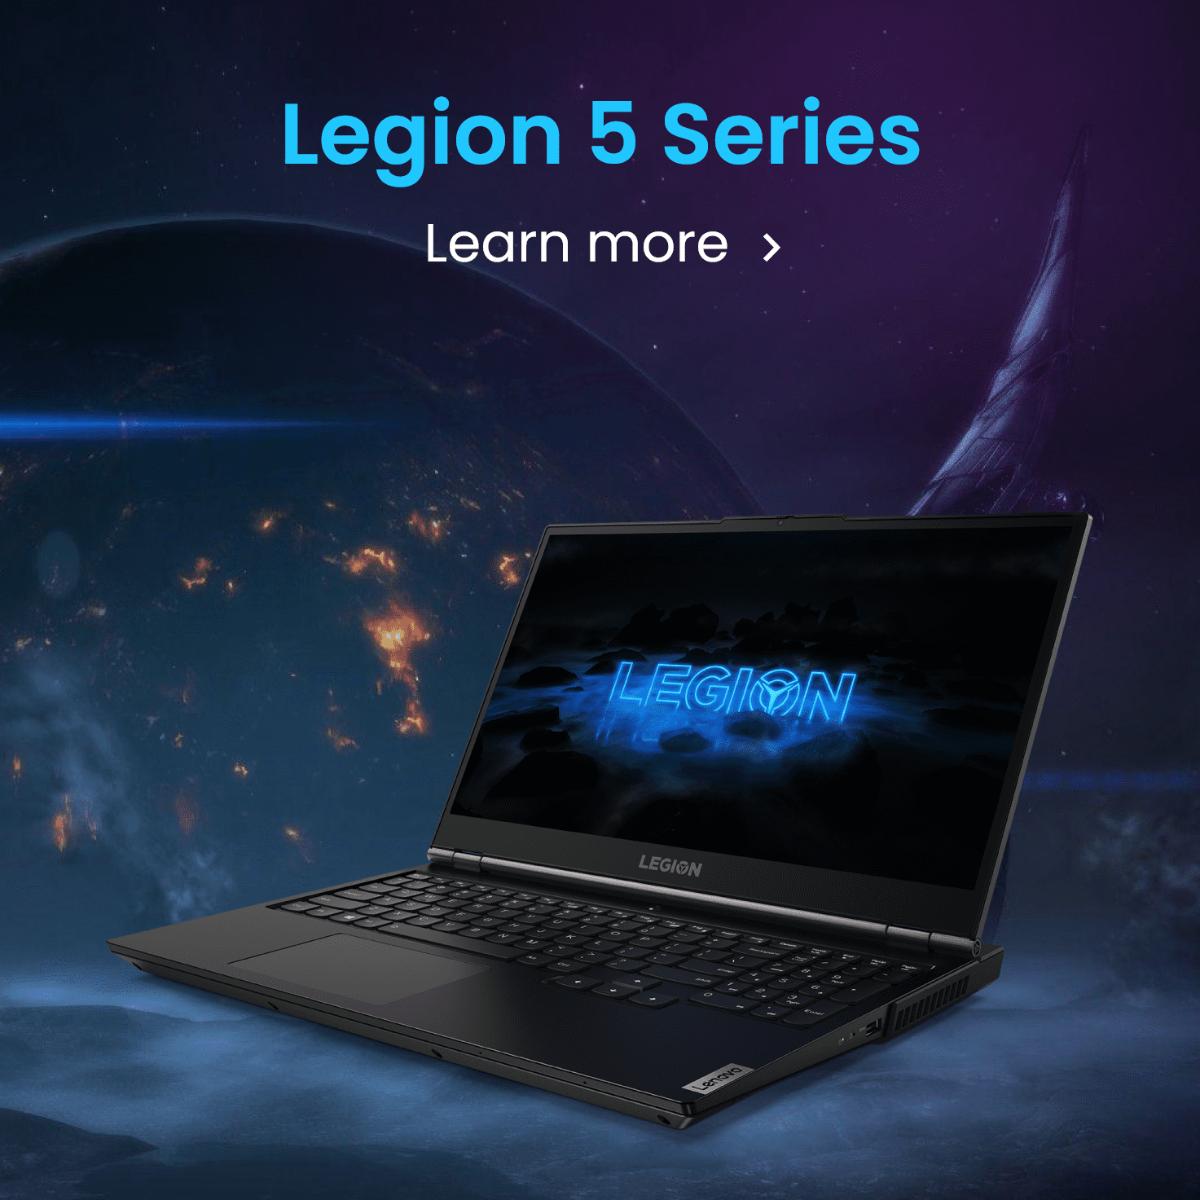 Legion 5 Series